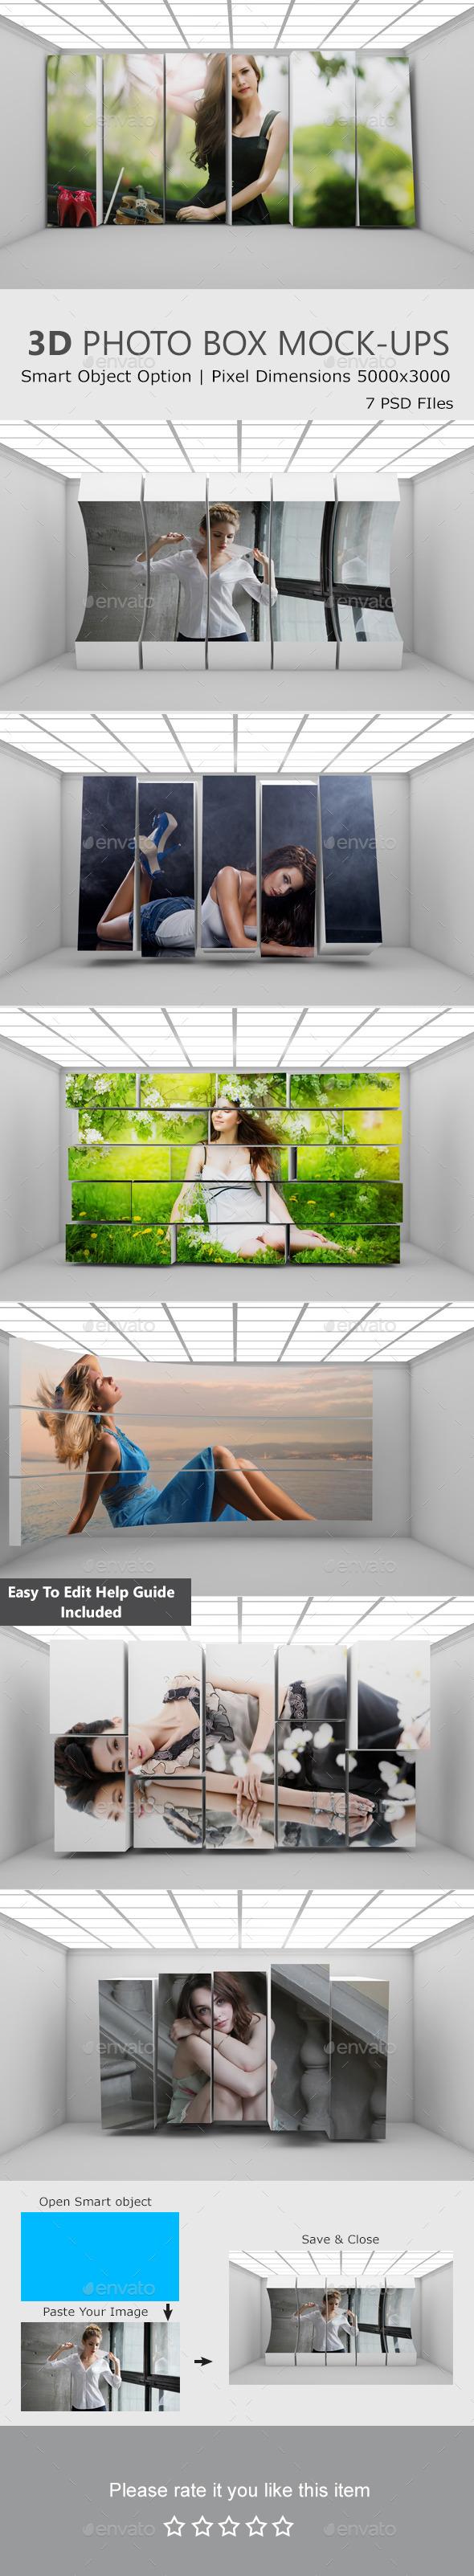 GraphicRiver 3D Photo Box Mockups 10917264